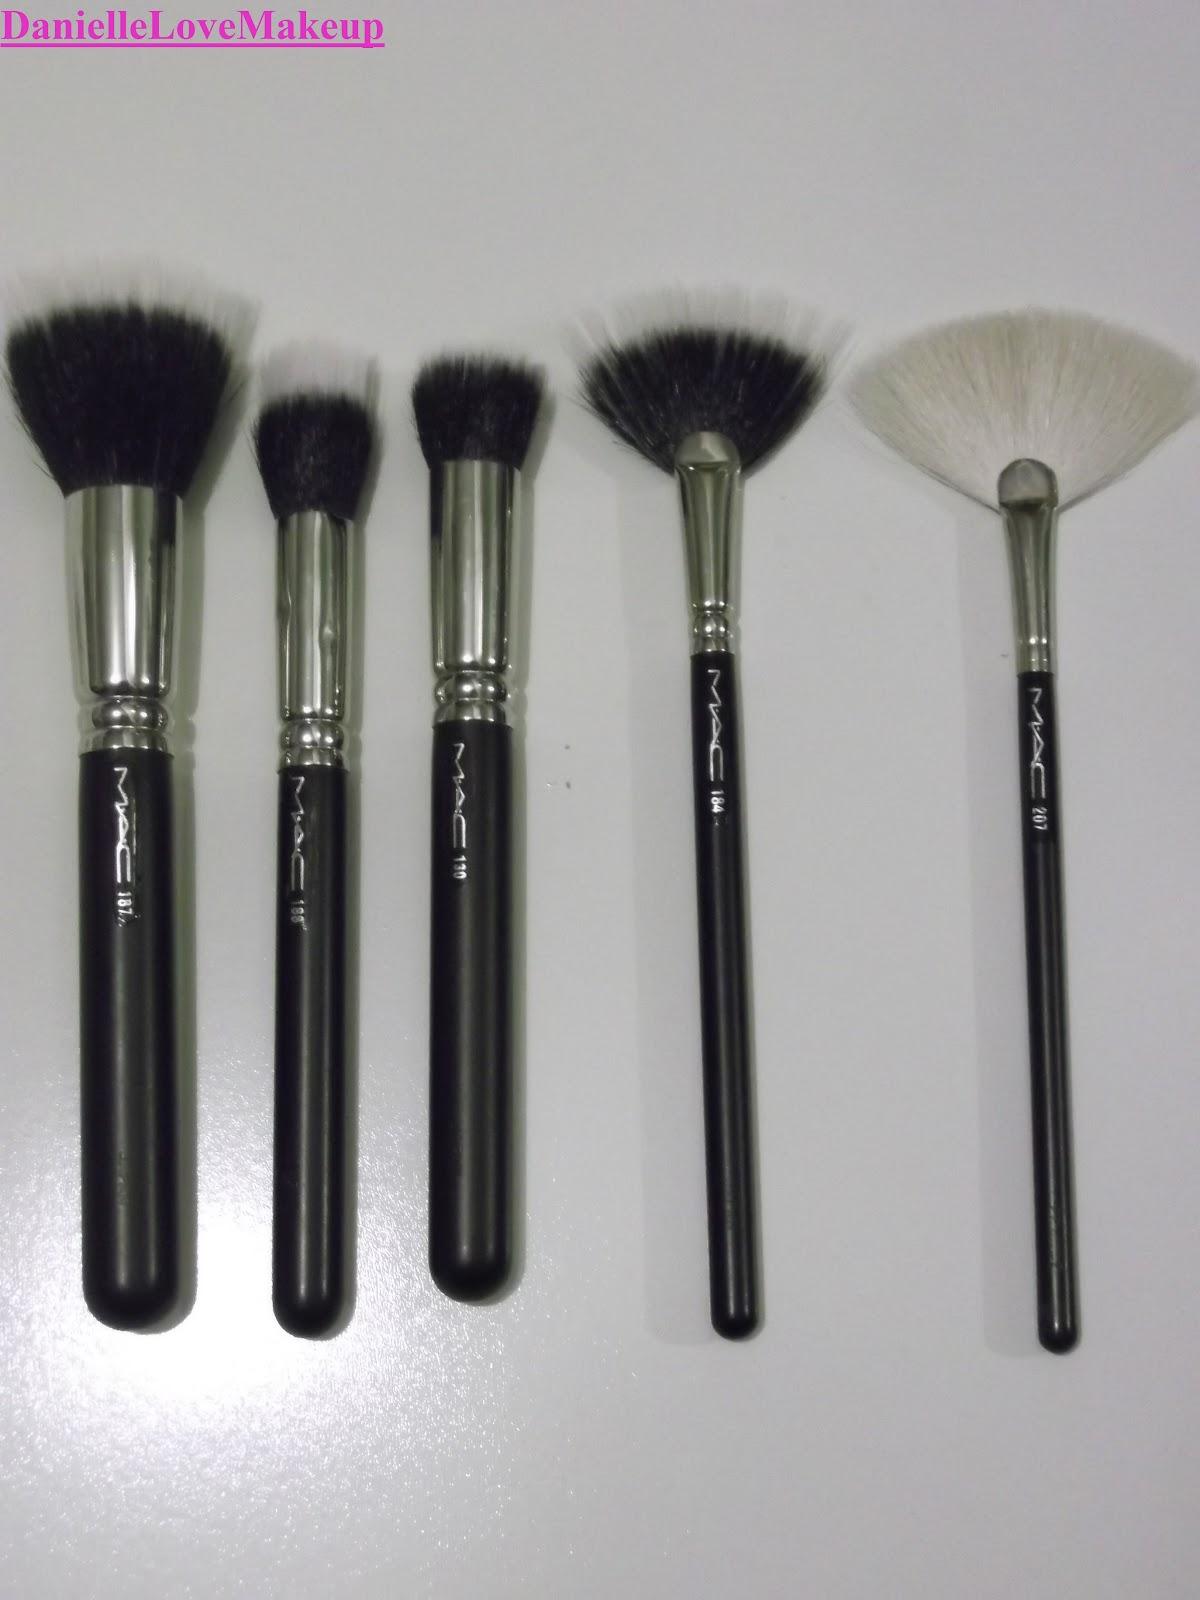 Mac 168 Large Angled Contour Brush: DanielleLoveMakeup: My Current MAC Brush Collection